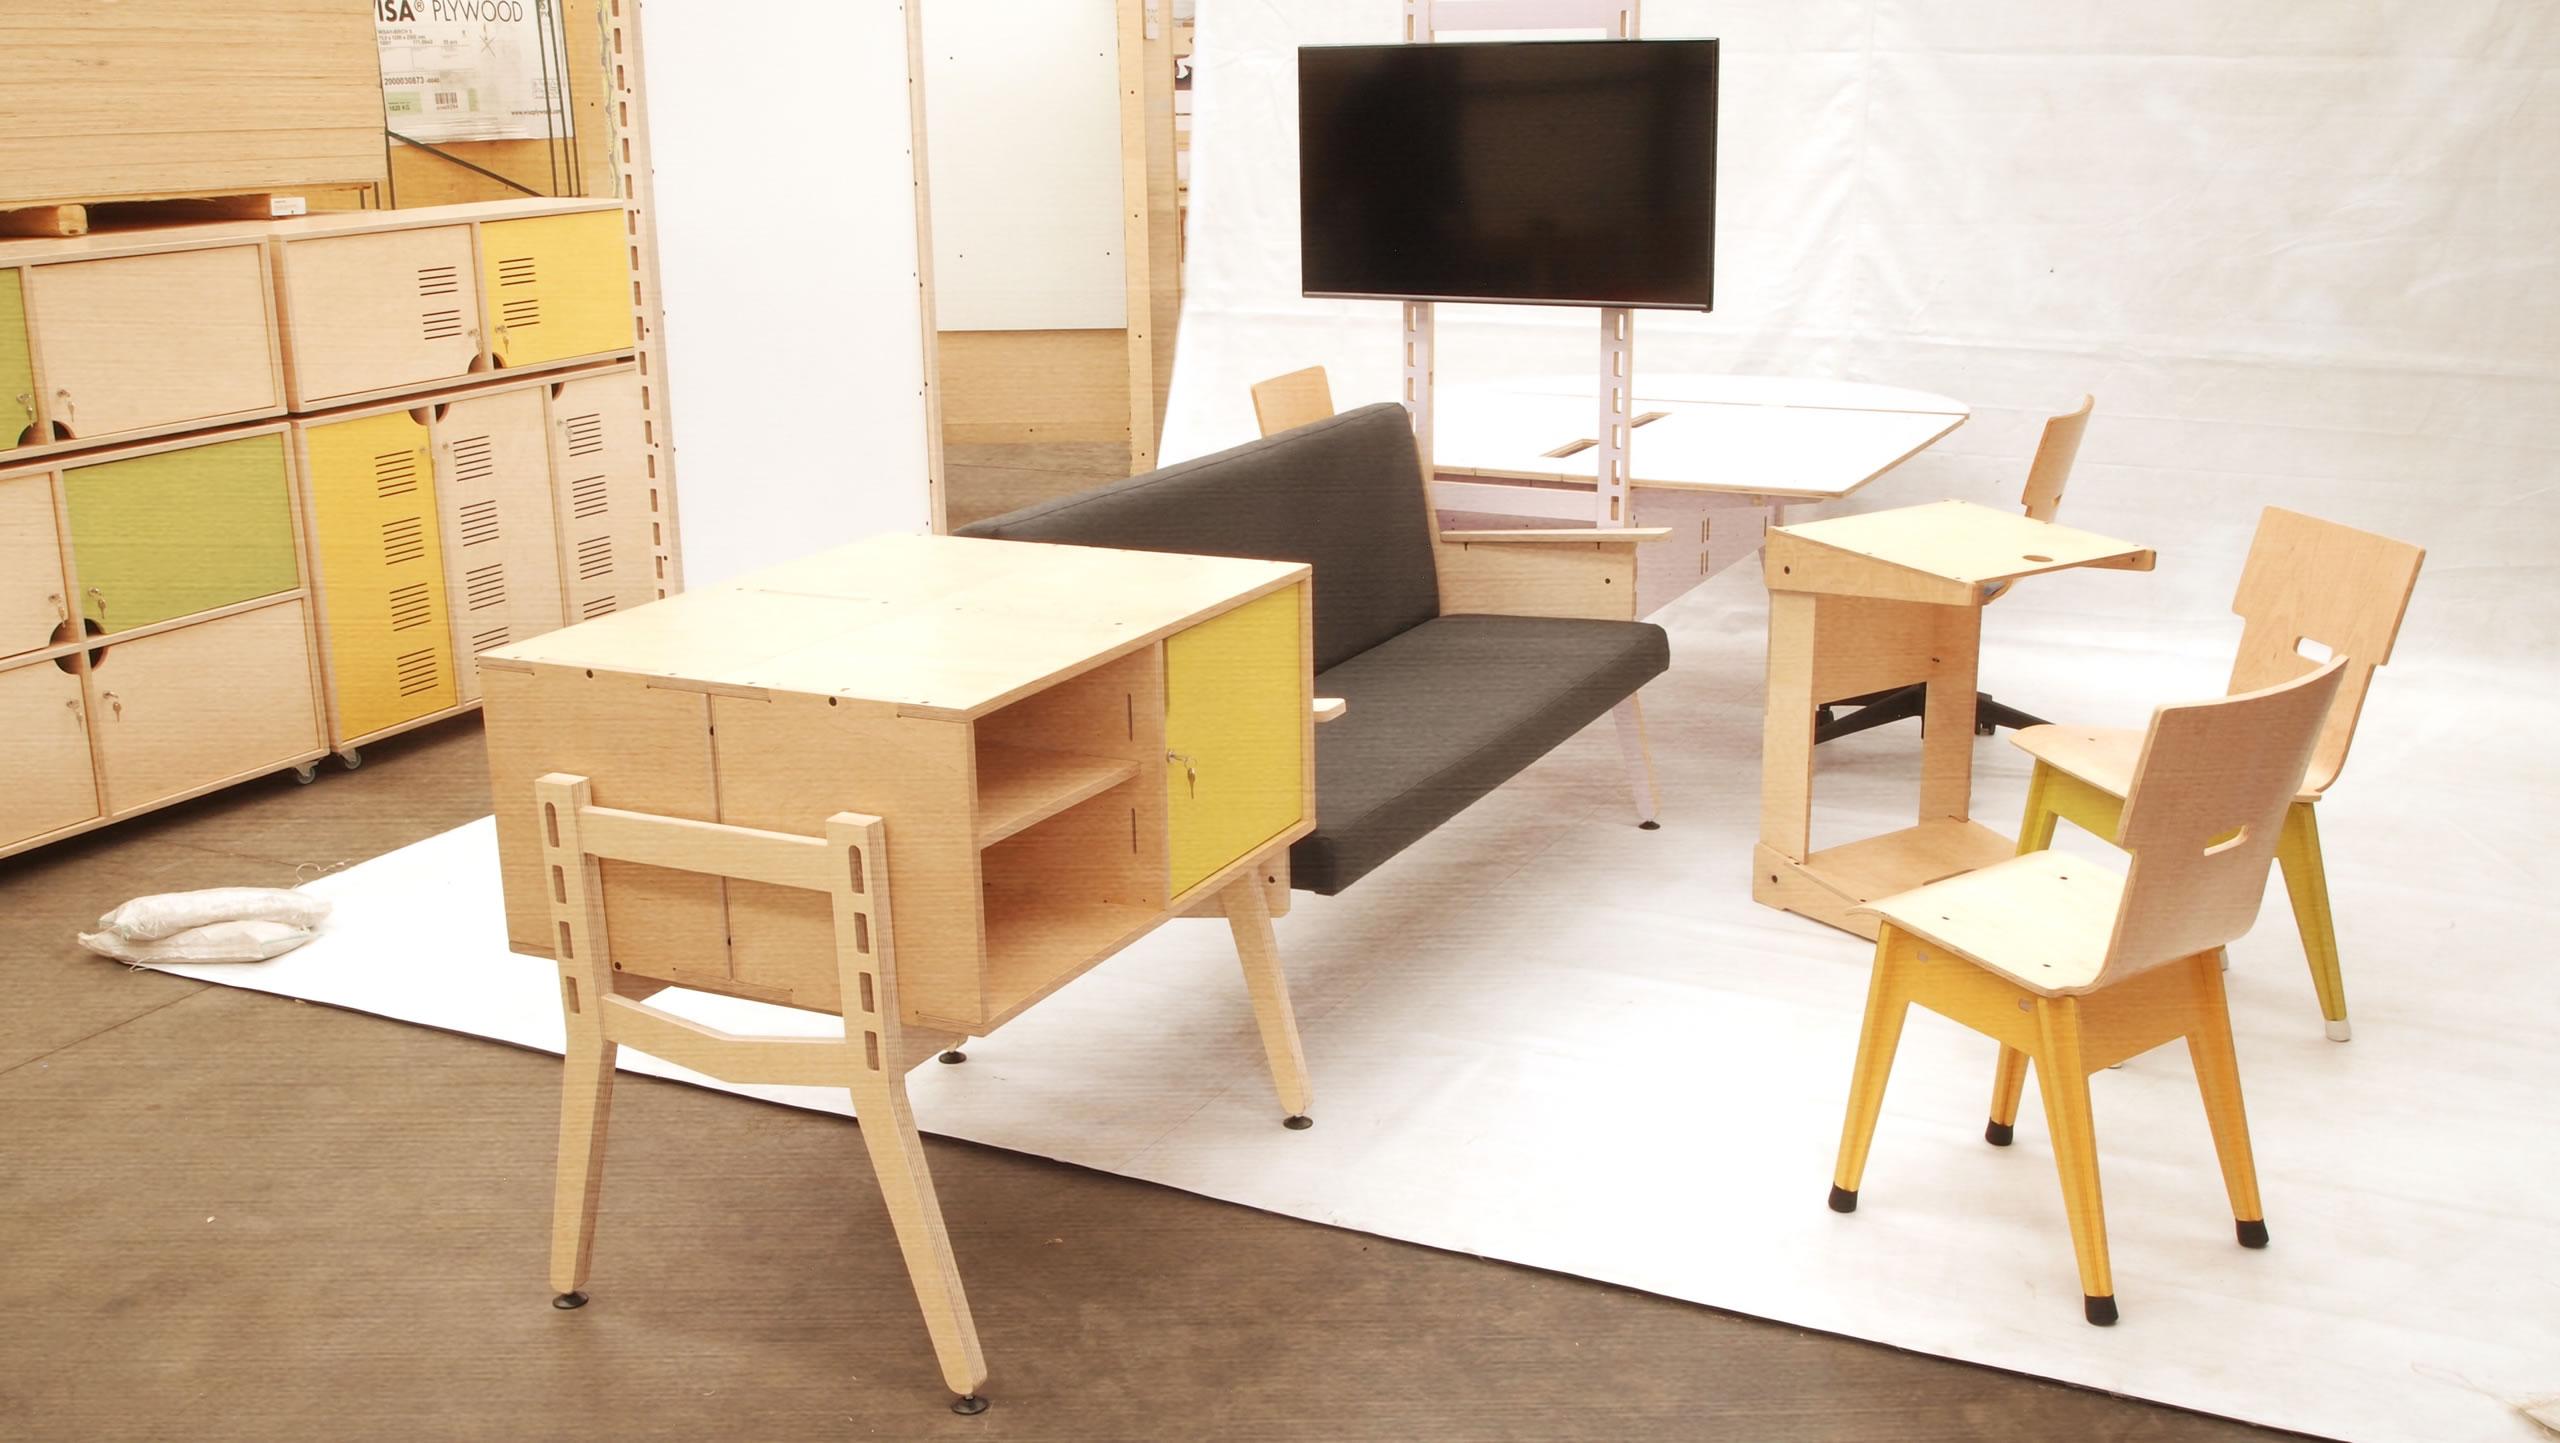 Superieur Spyne Raw Studios New Modular Office Furniture Sytem Range